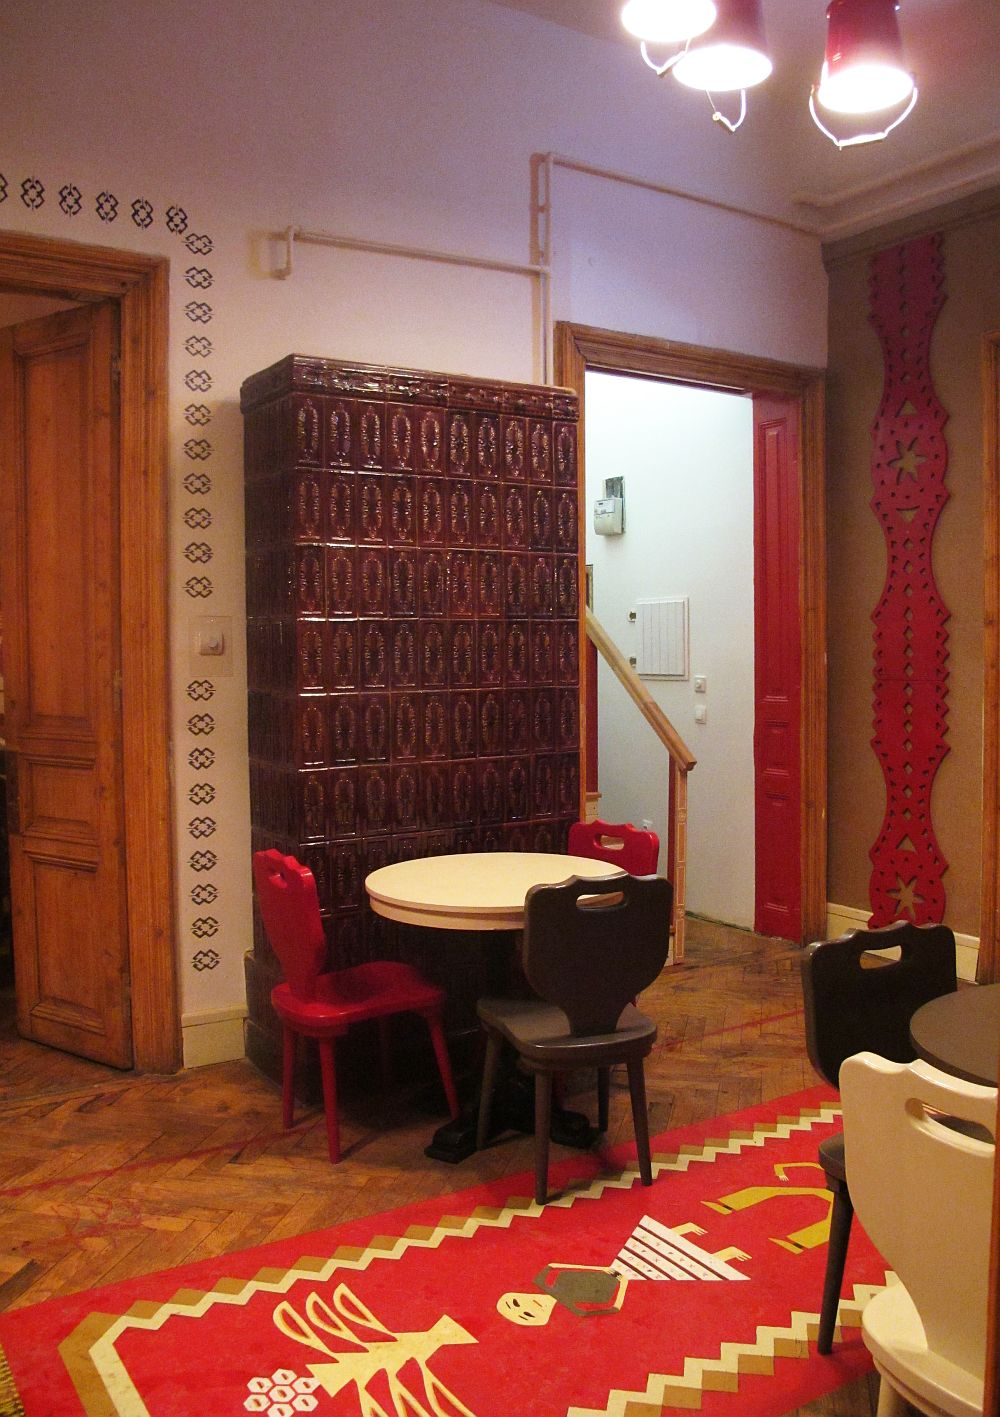 adelaparvu.com despre La Copac, design Interior Mihai Grama (4)